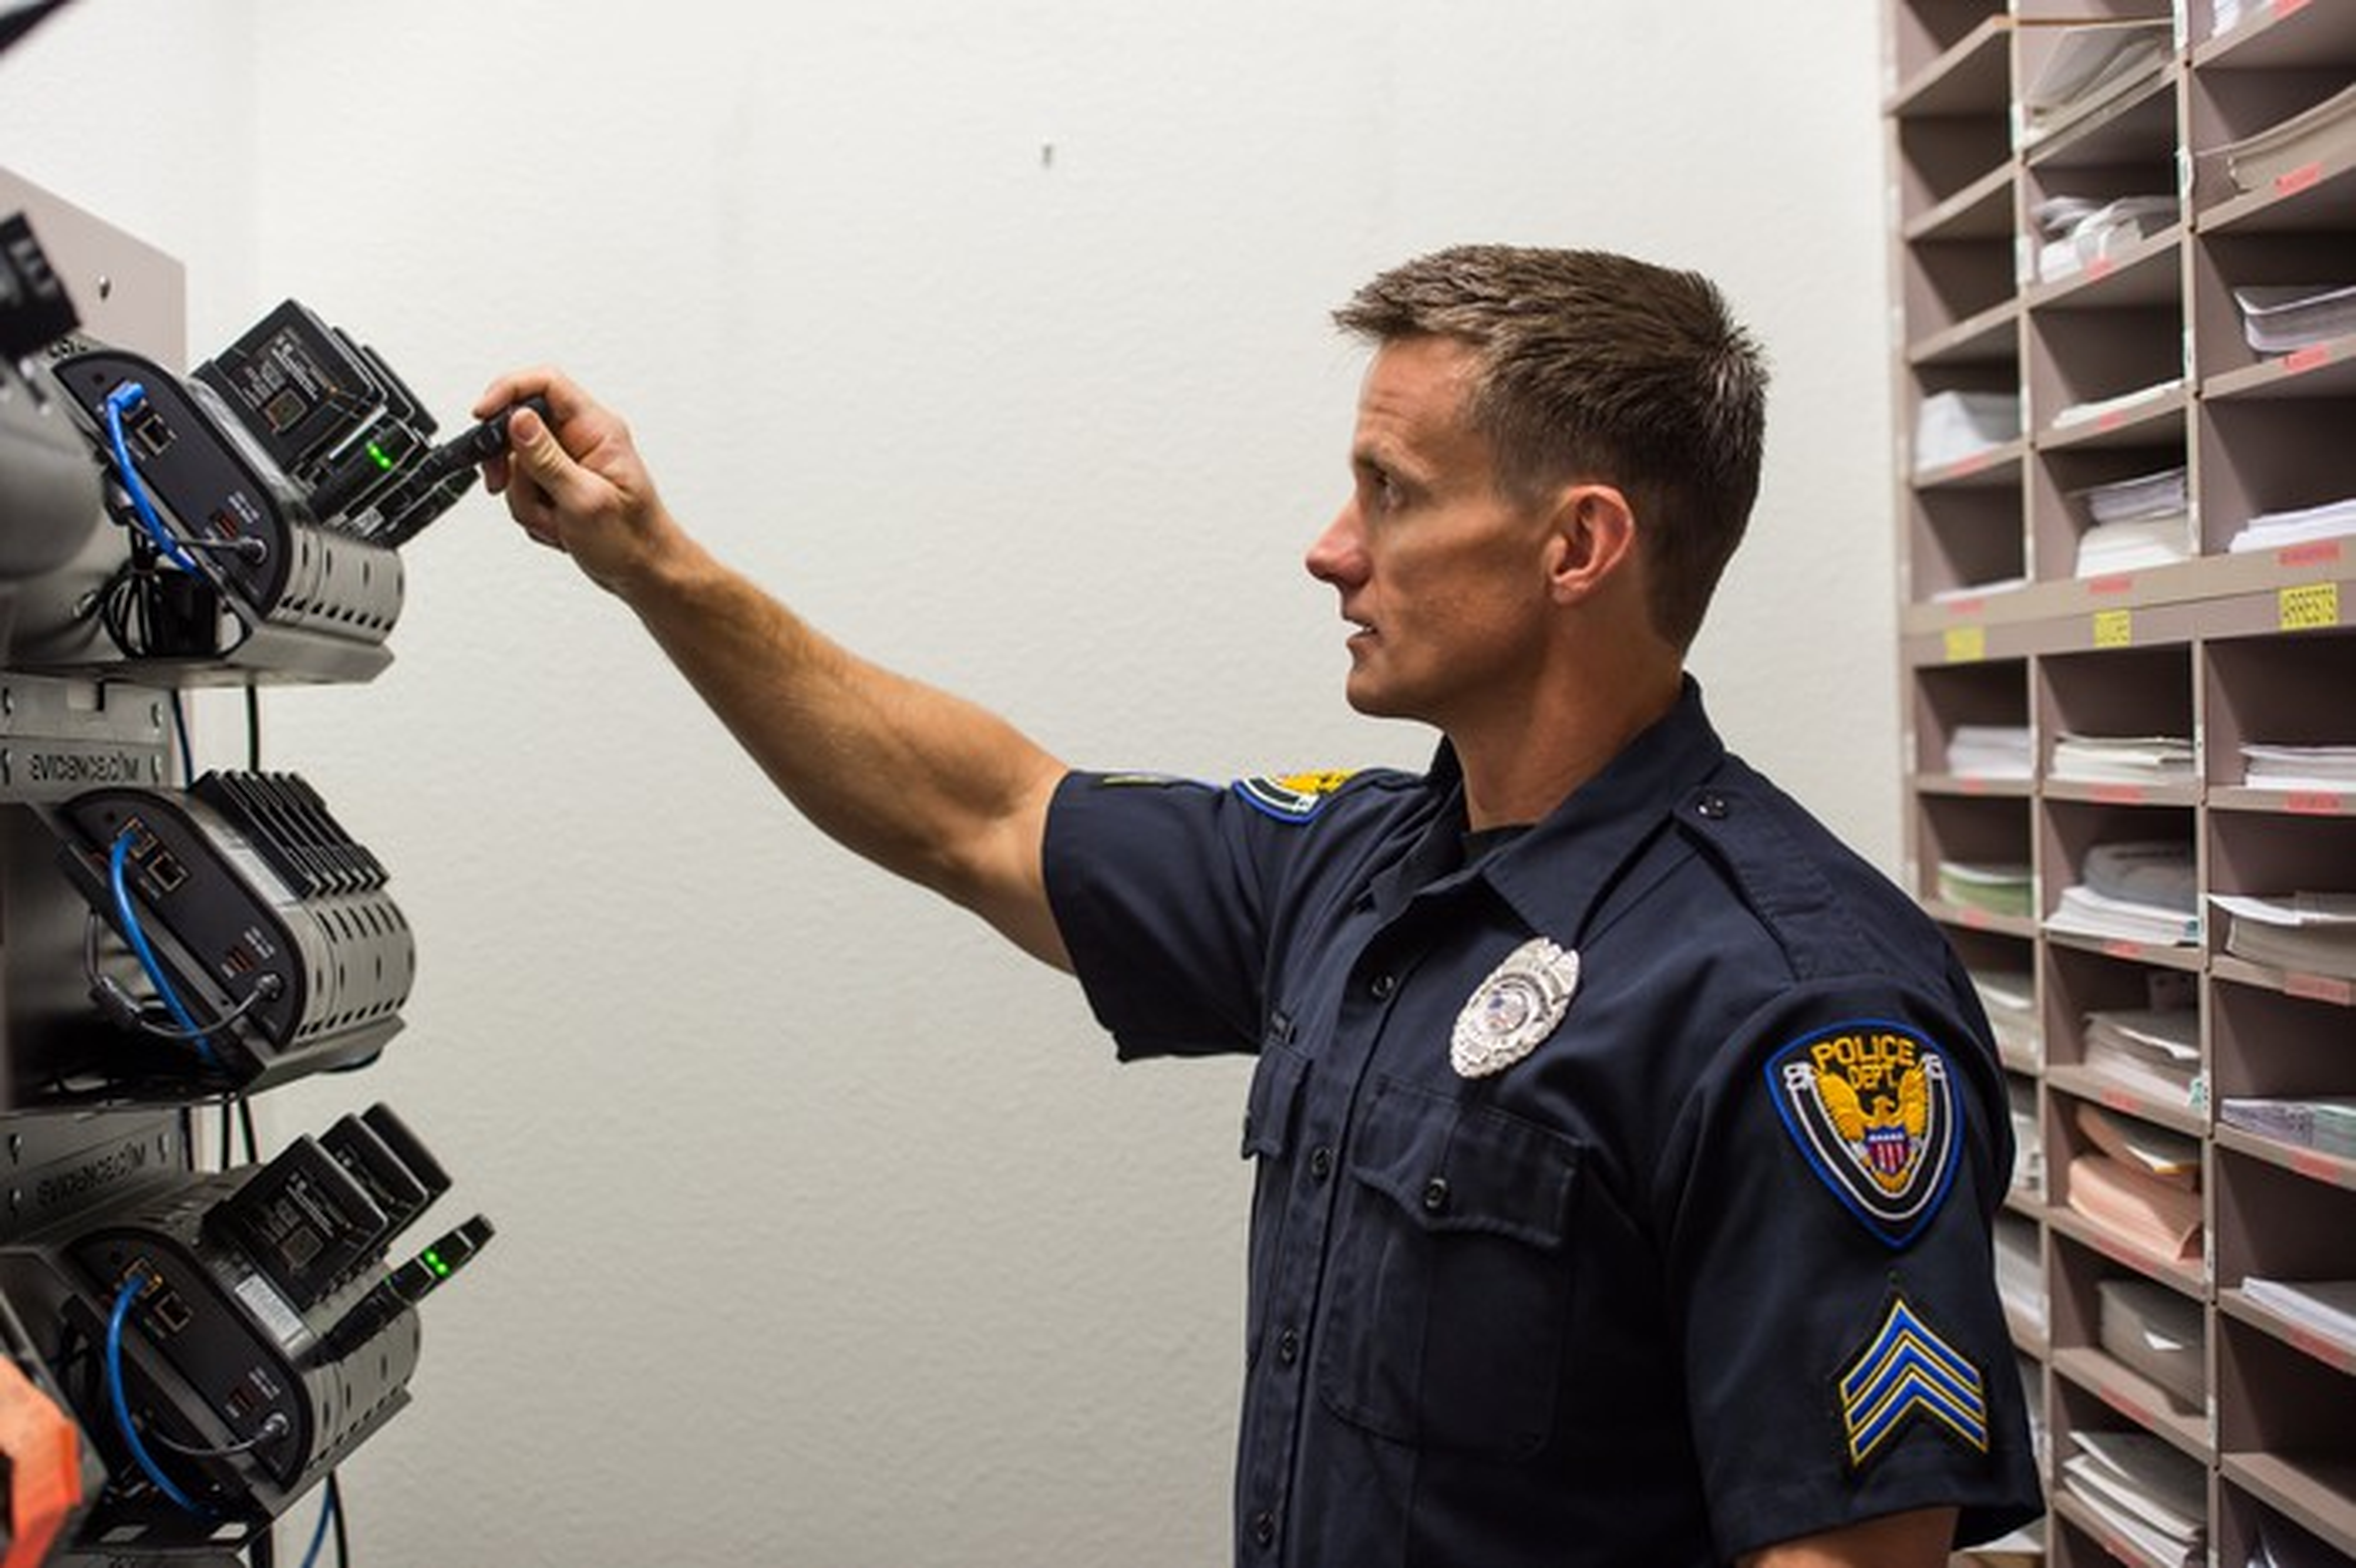 A man in a police uniform putting a body camera in a dock.